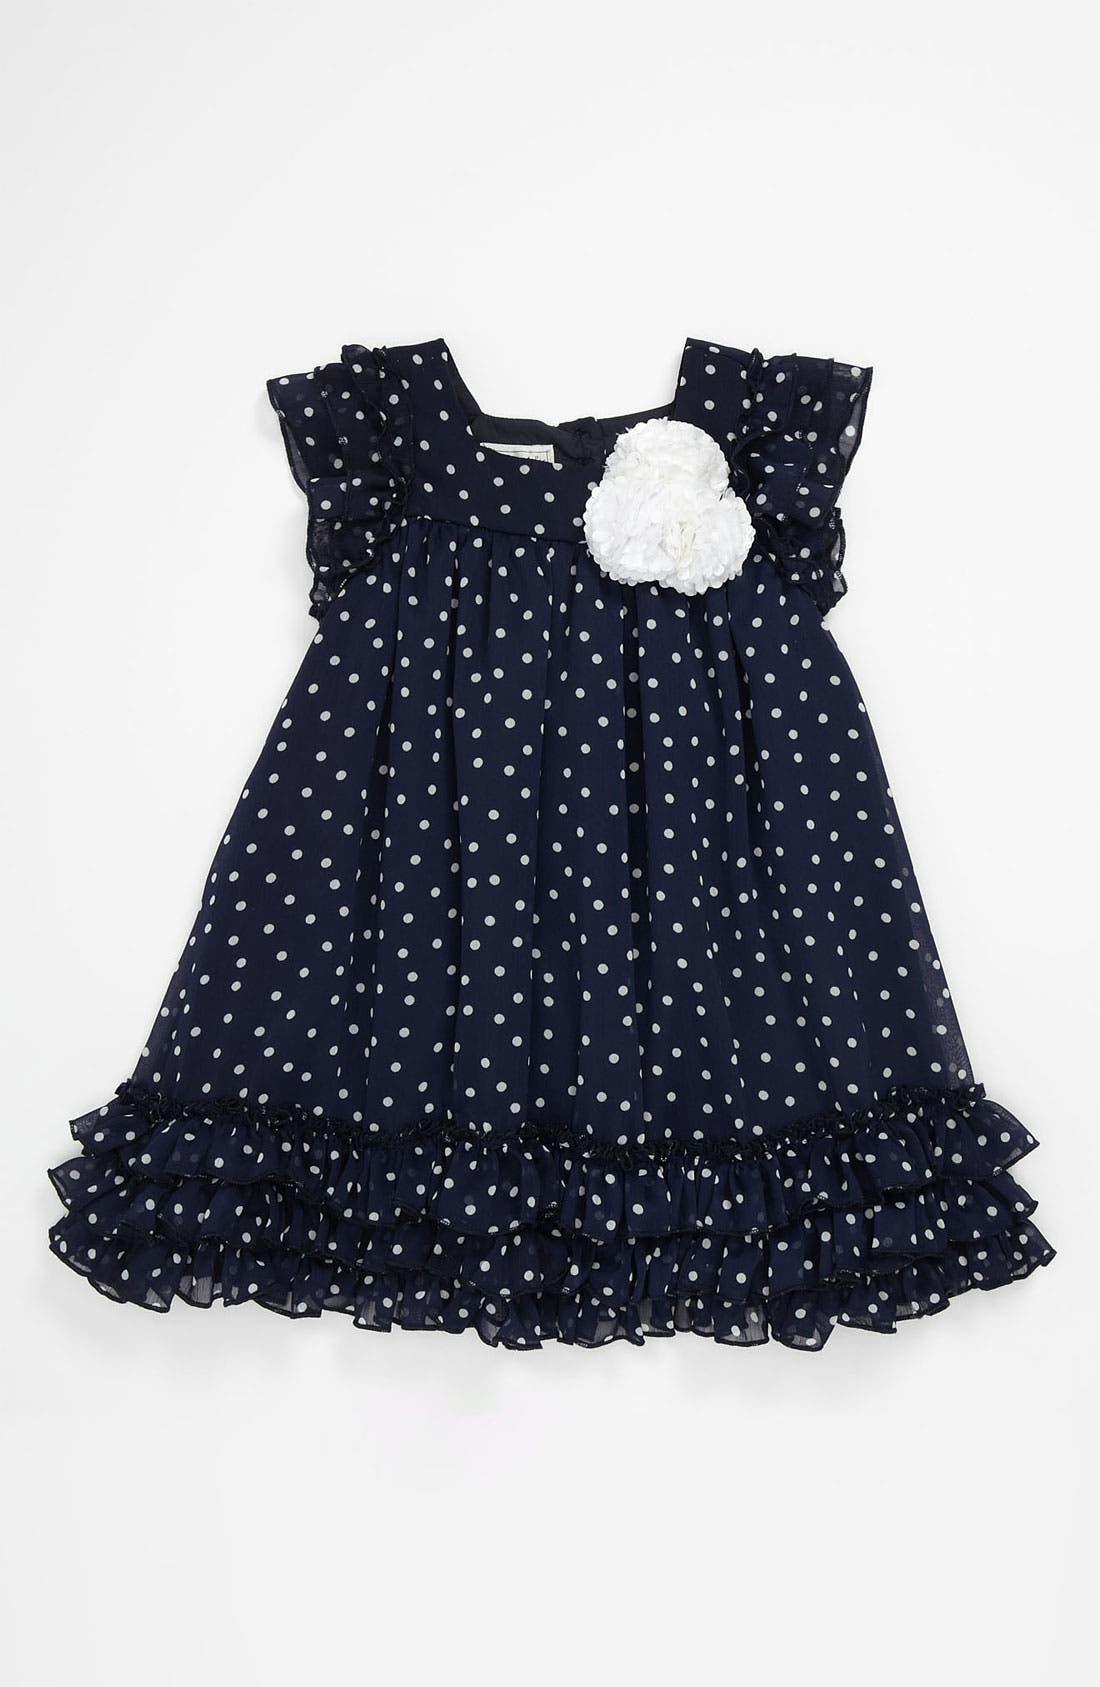 Main Image - Pippa & Julie Polka Dot Dress (Toddler)